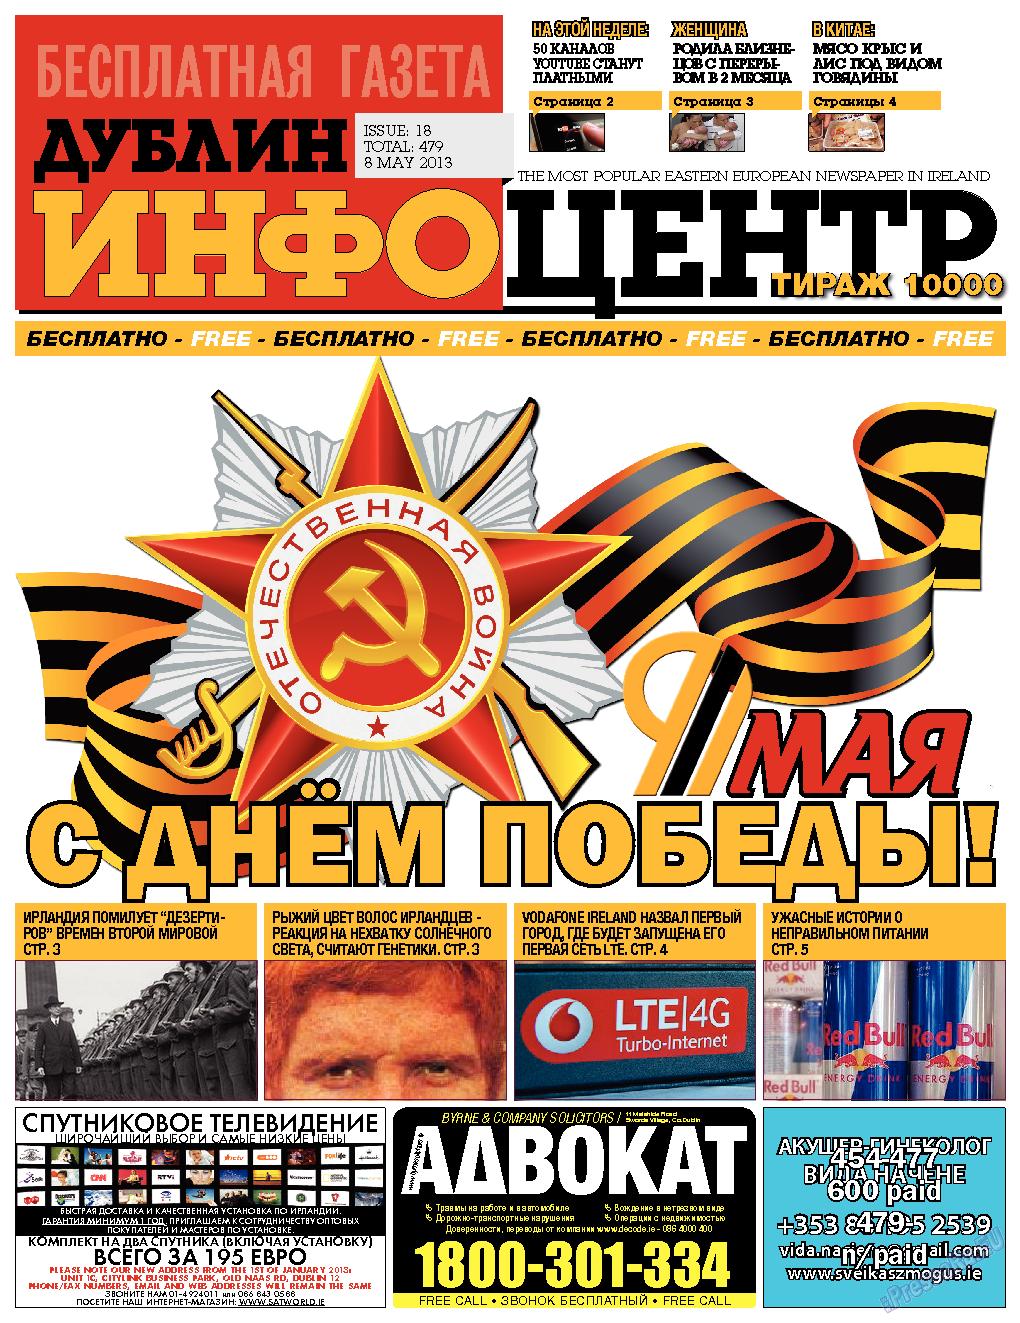 Дублин инфоцентр (газета). 2013 год, номер 18, стр. 1